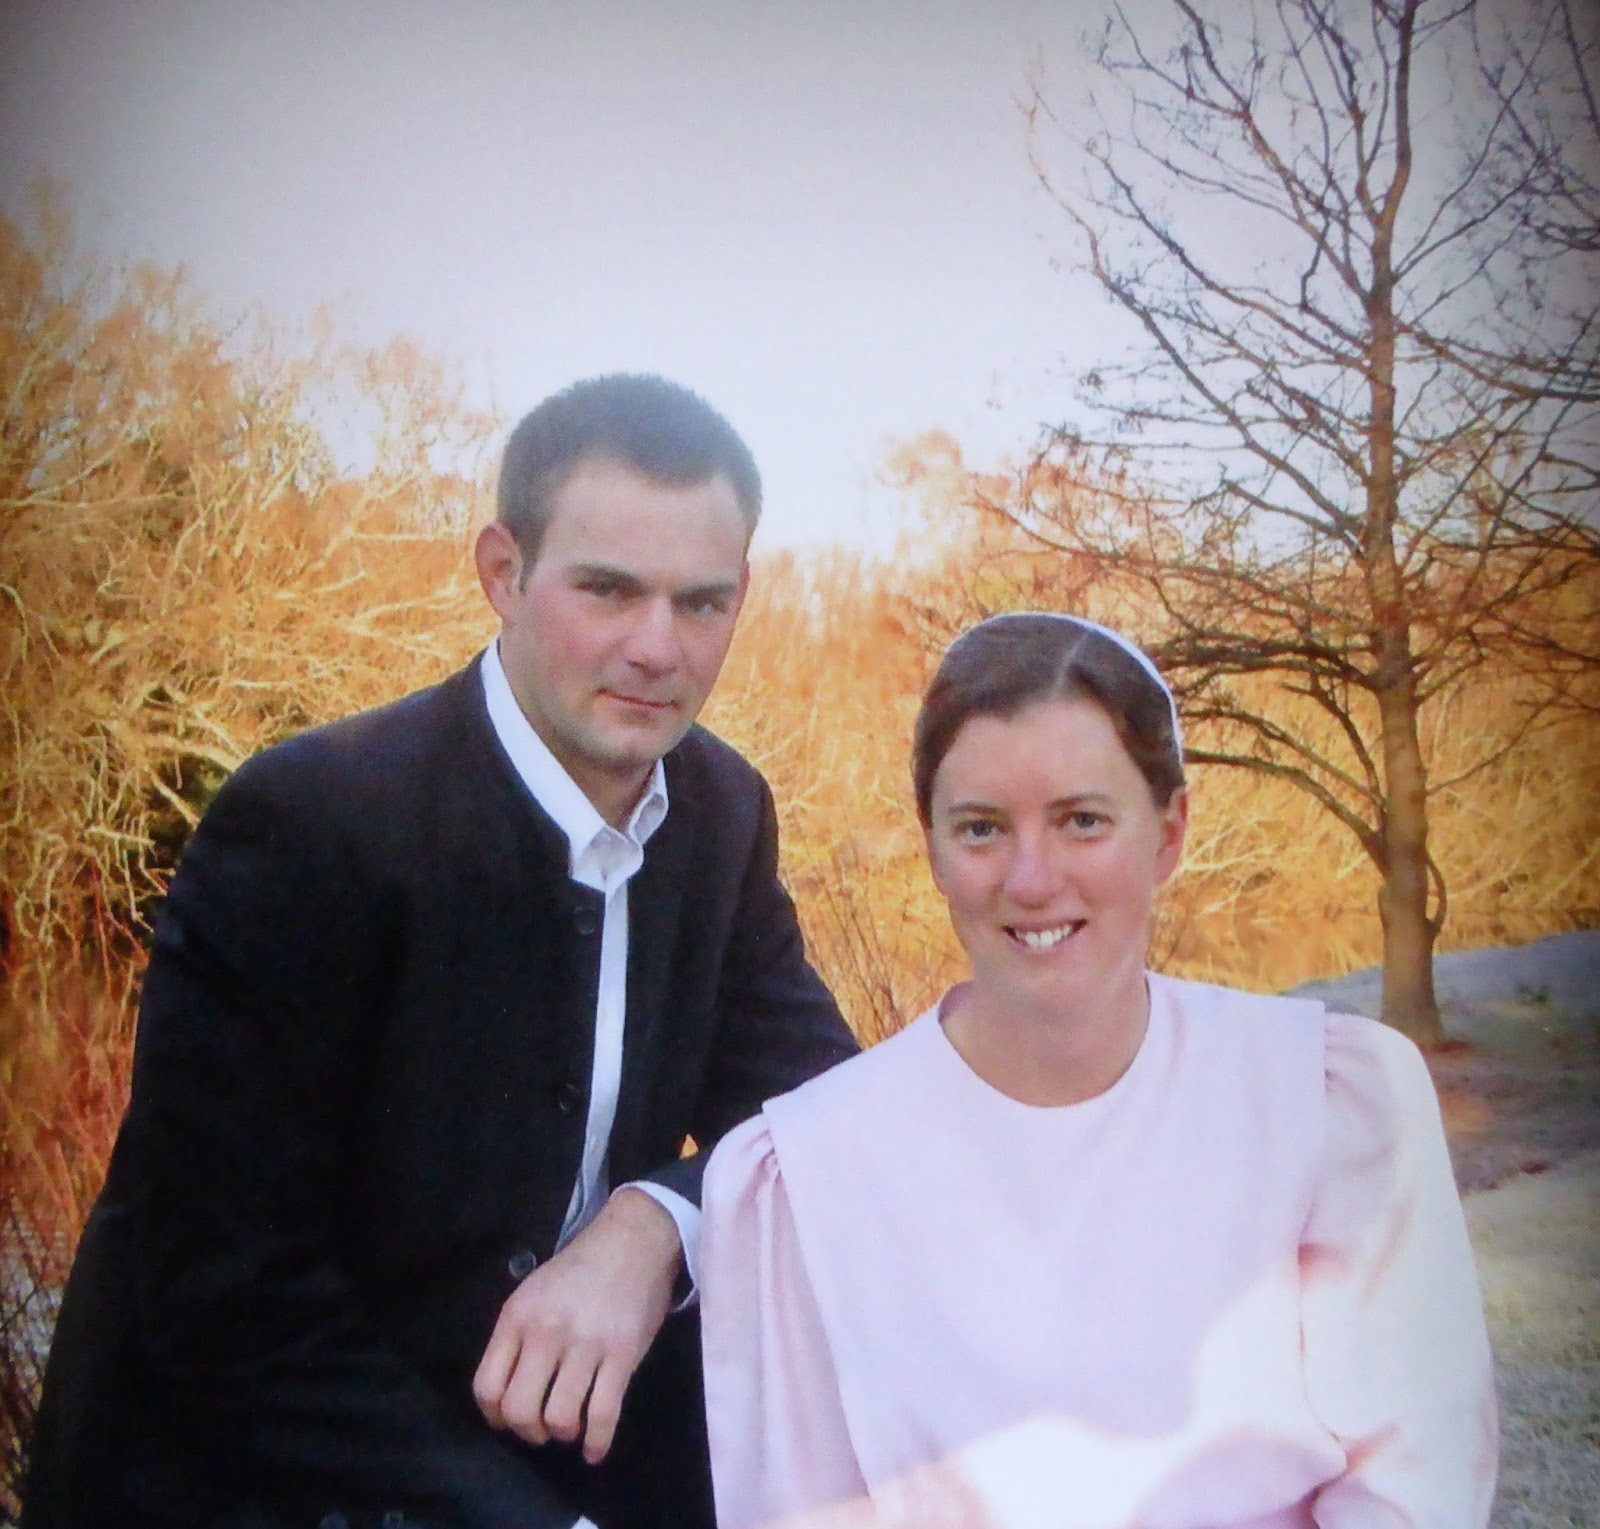 mennonite marriage customs